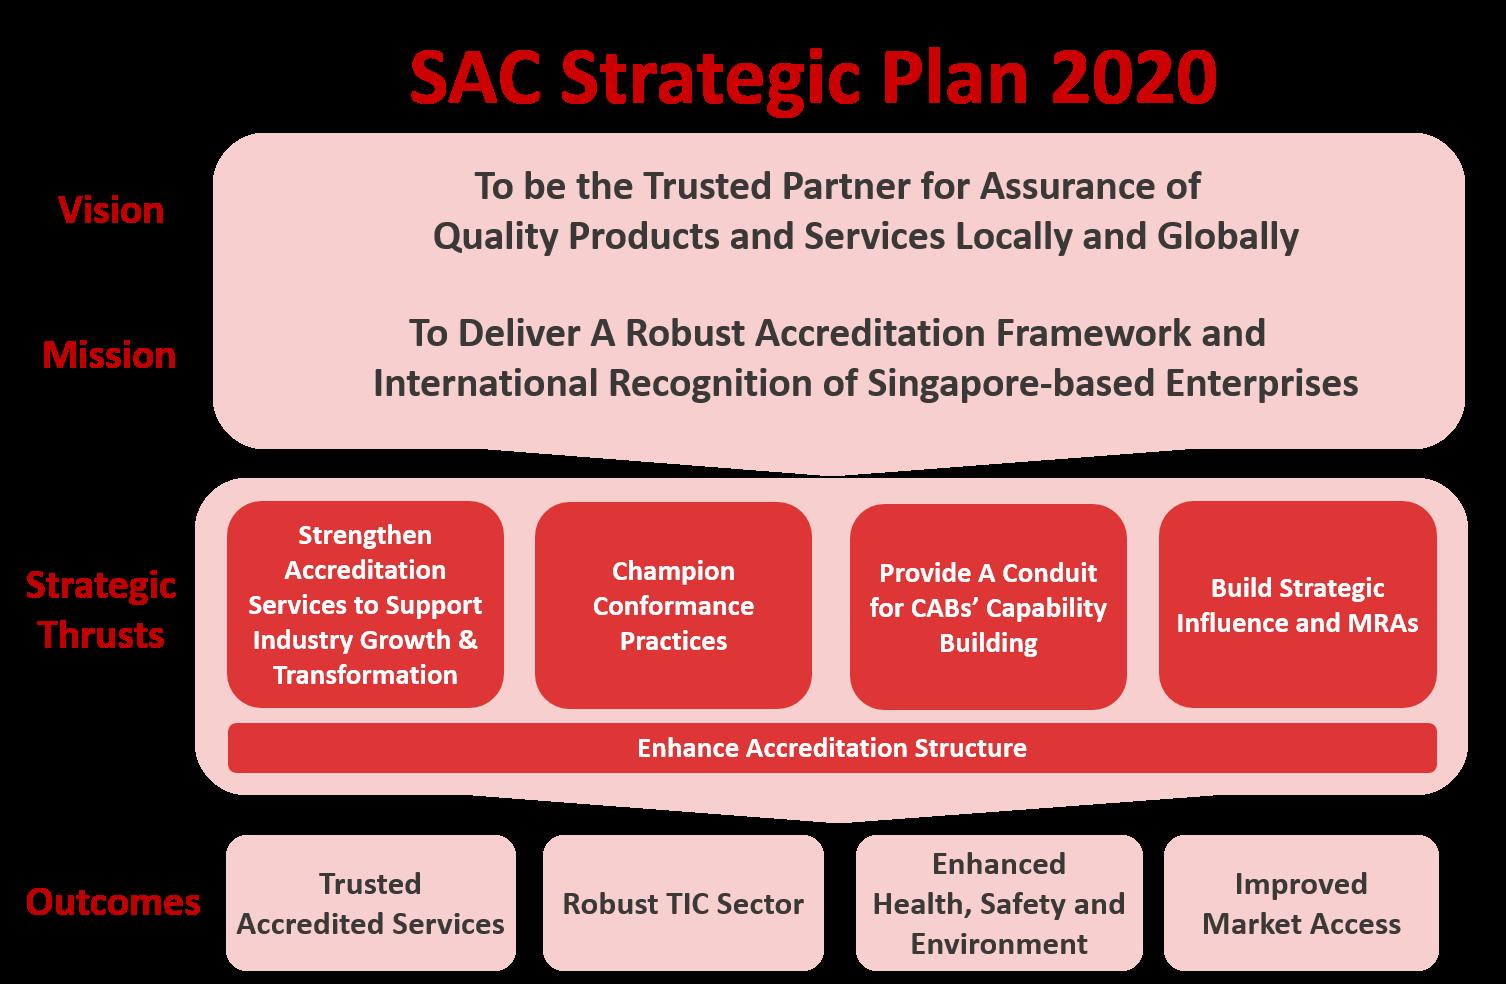 SAC Strategic Plan 2020